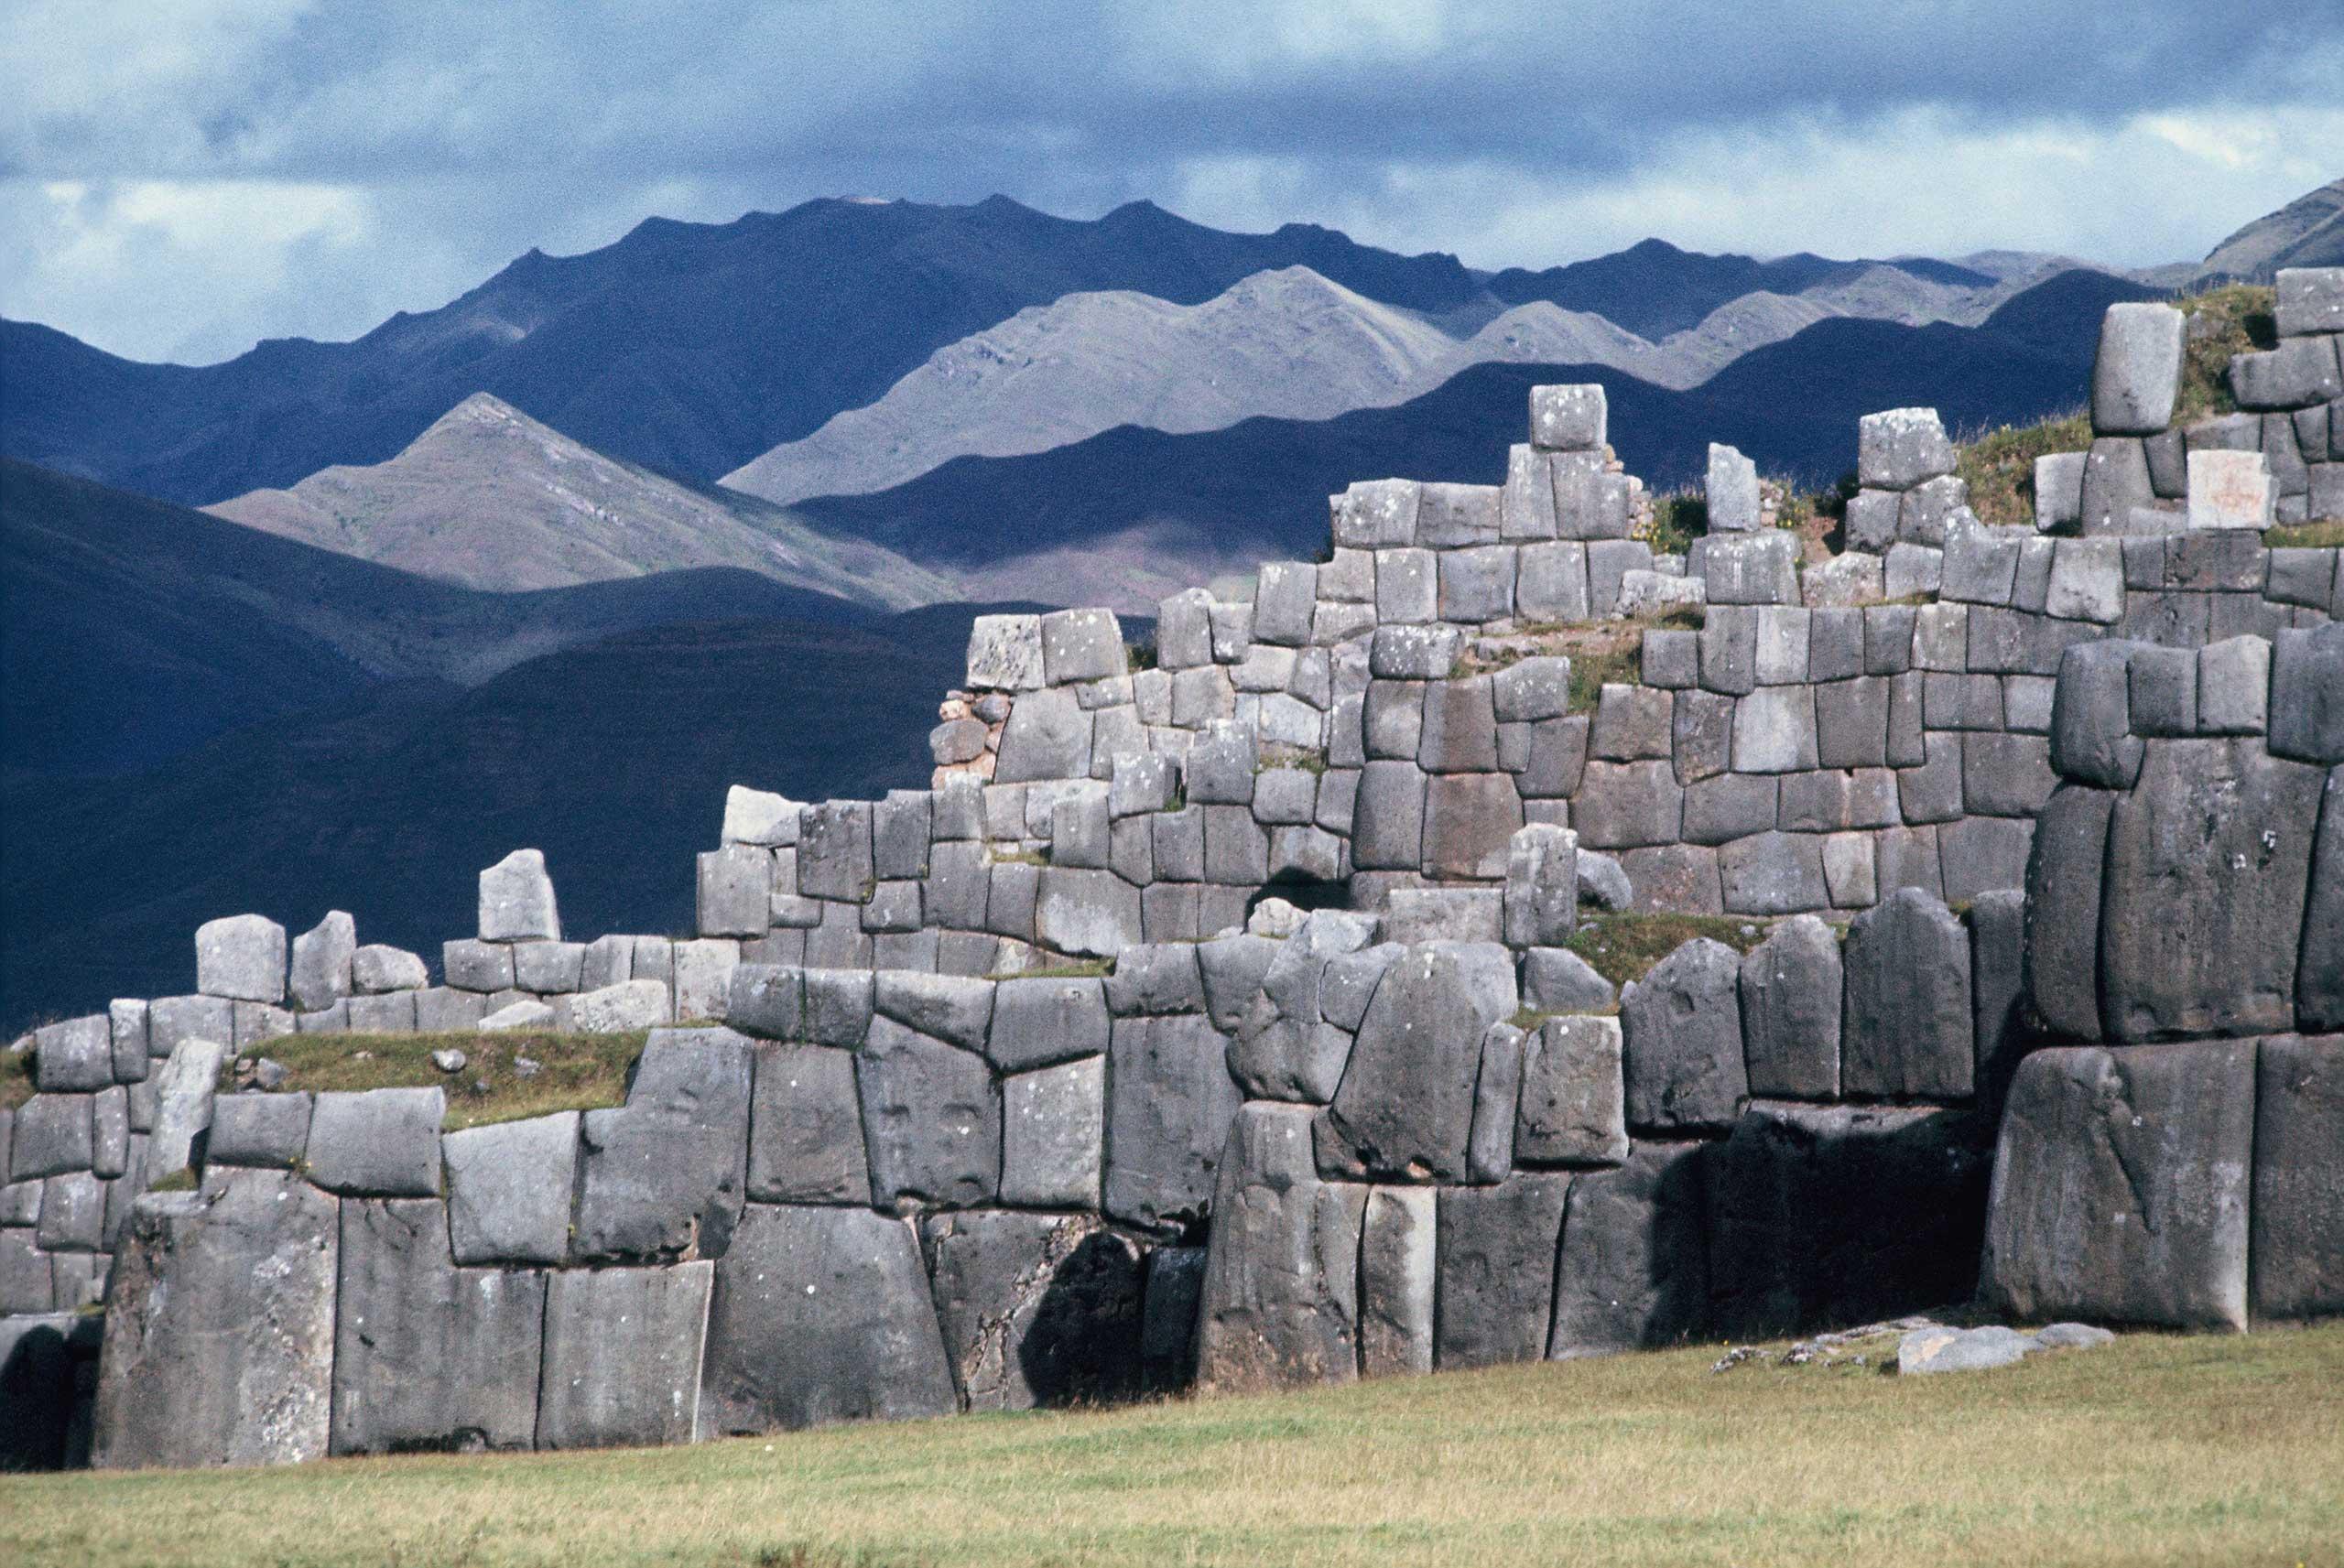 The Inca fortress of Saqsaywaman